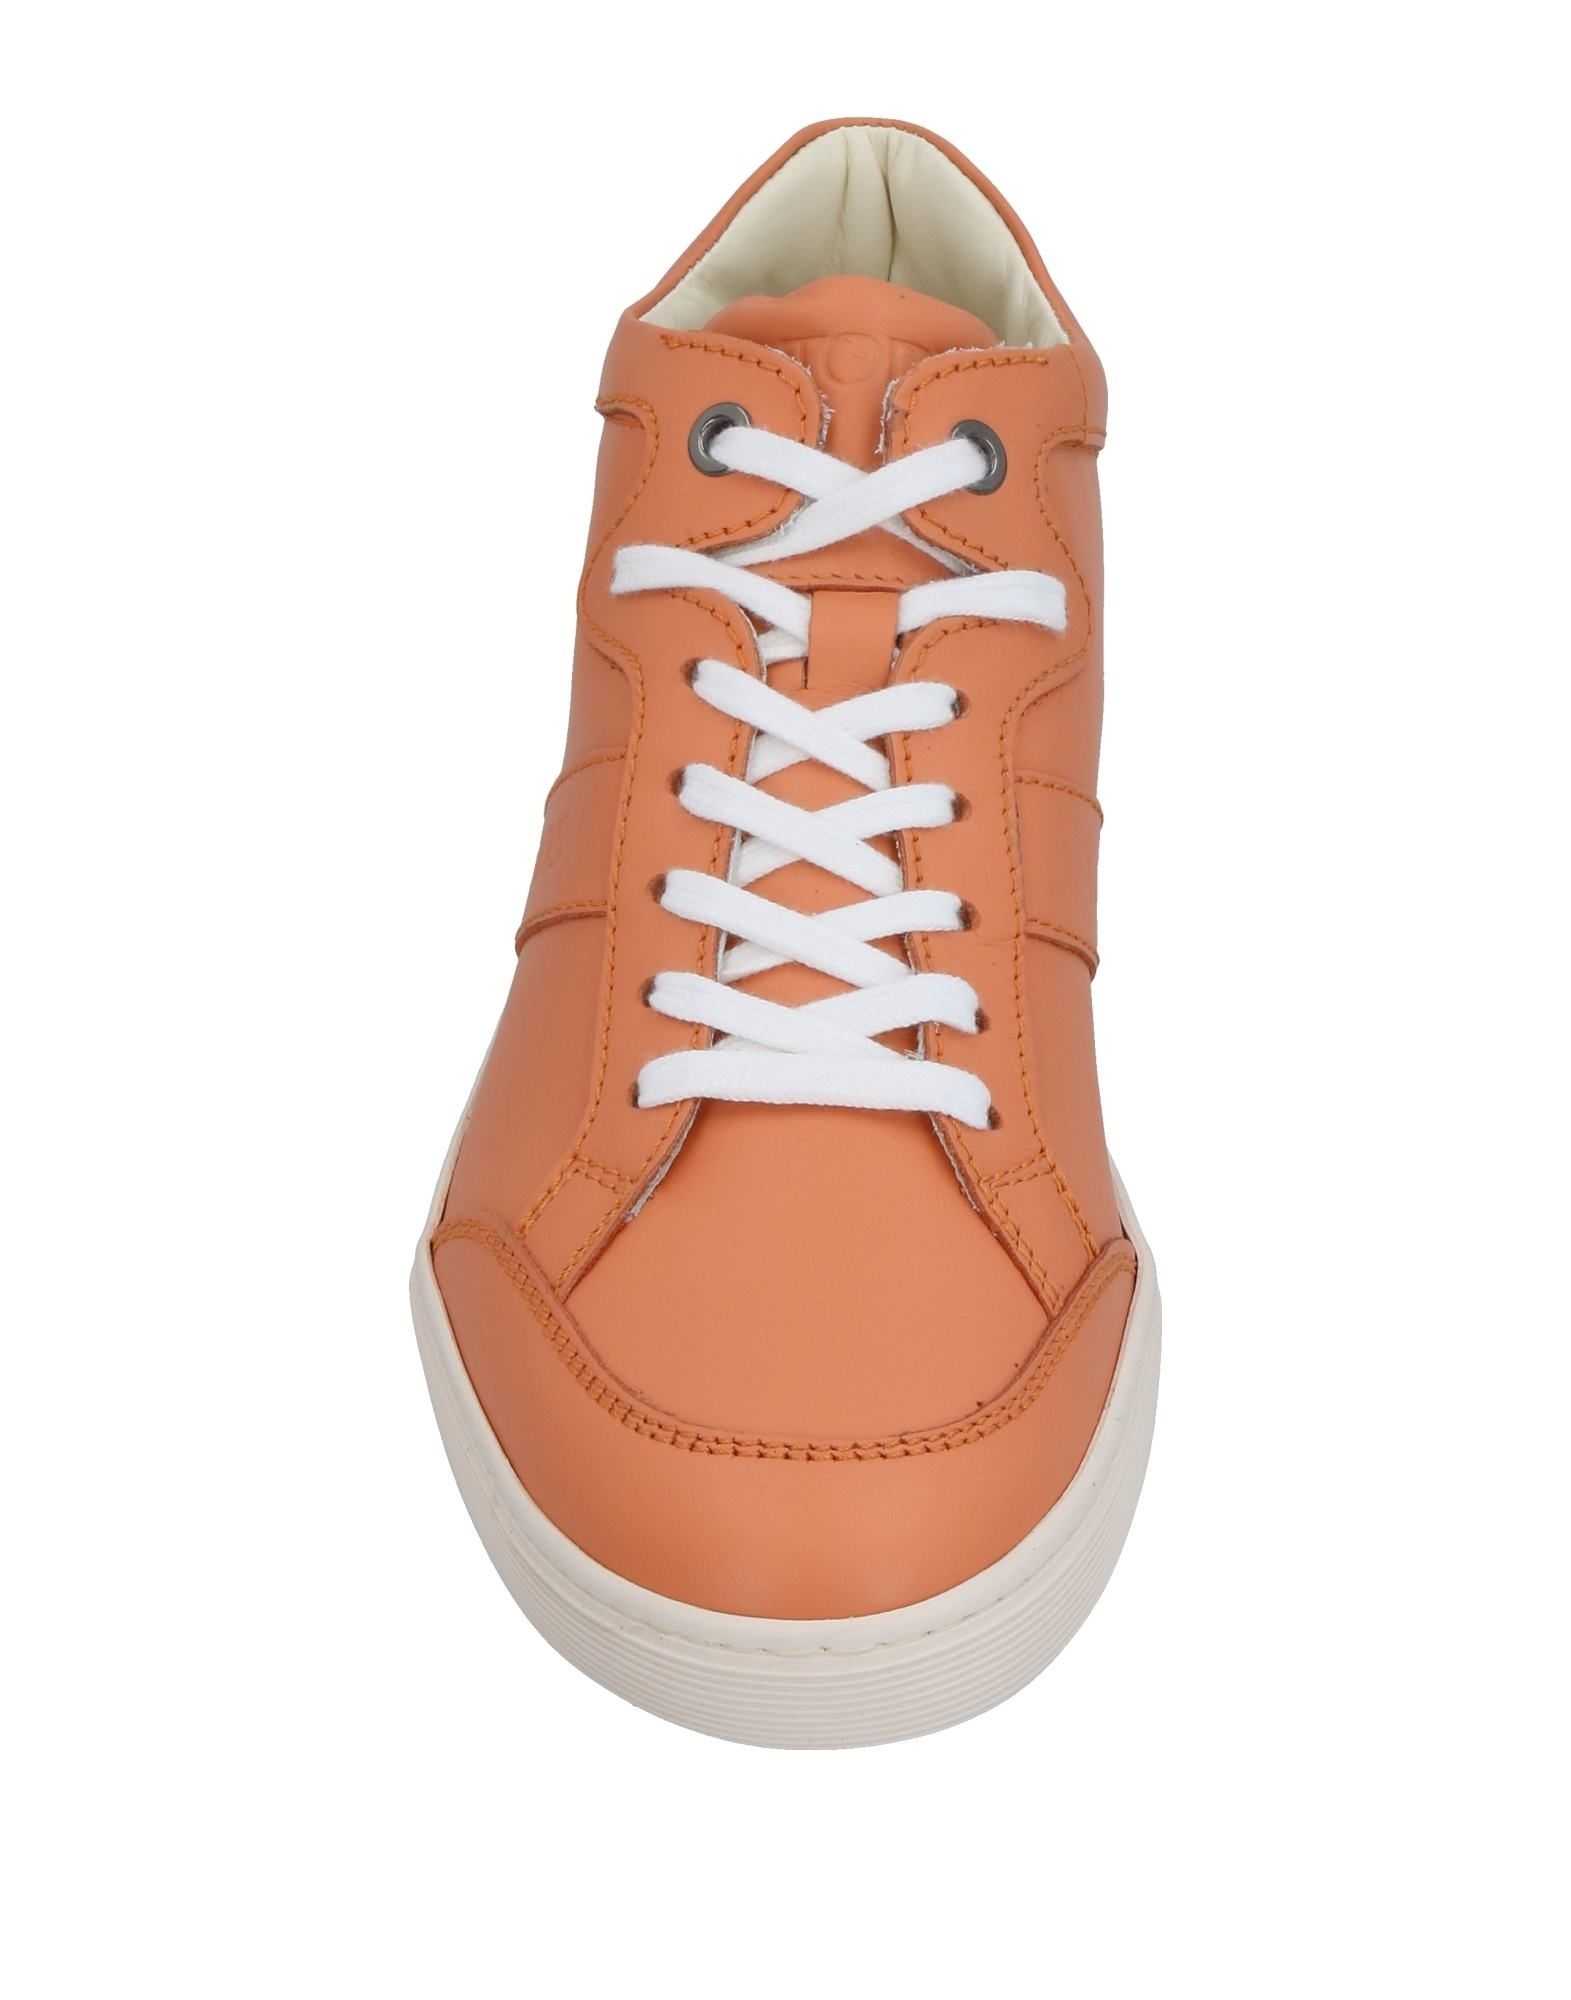 f2fc8236b1f TOD'S ΠΑΠΟΥΤΣΙΑ Παπούτσια τένις χαμηλά, Γυναικεία παπούτσια τέννις, ΓΥΝΑΙΚΑ  | ΠΑΠΟΥΤΣΙΑ | ΤΕΝΝΙΣ